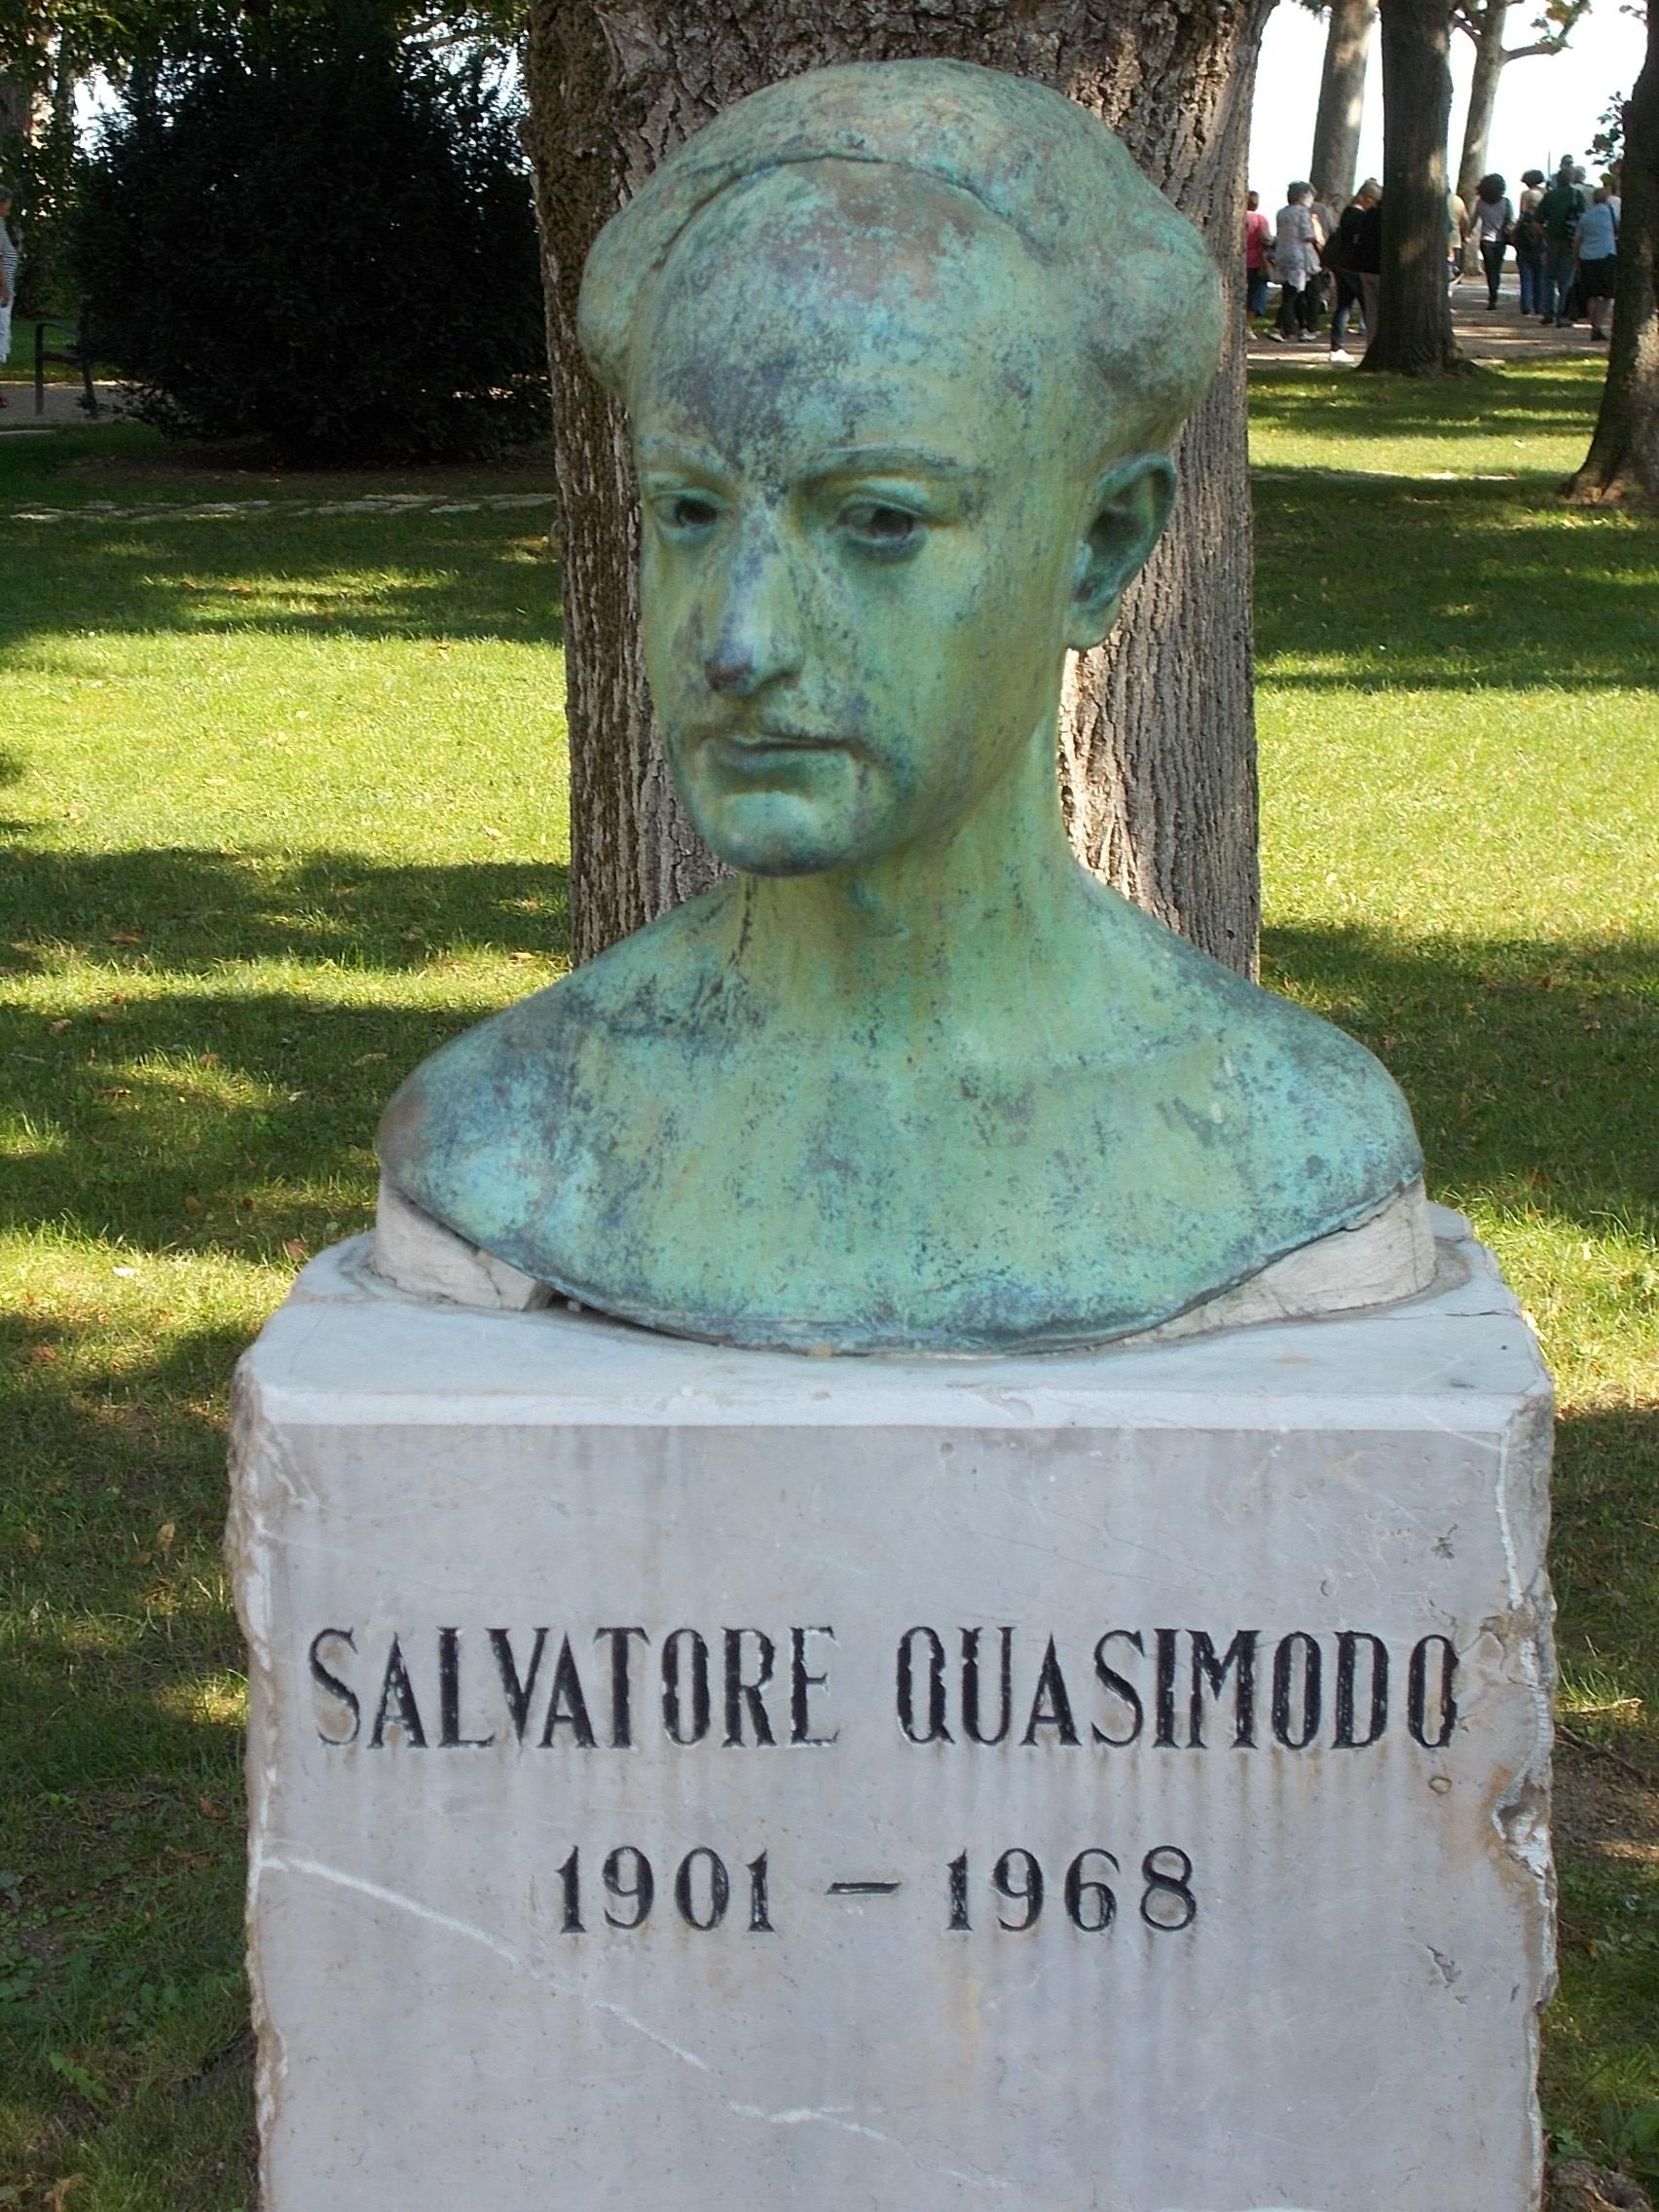 Резултат с изображение за salvatore quasimodo